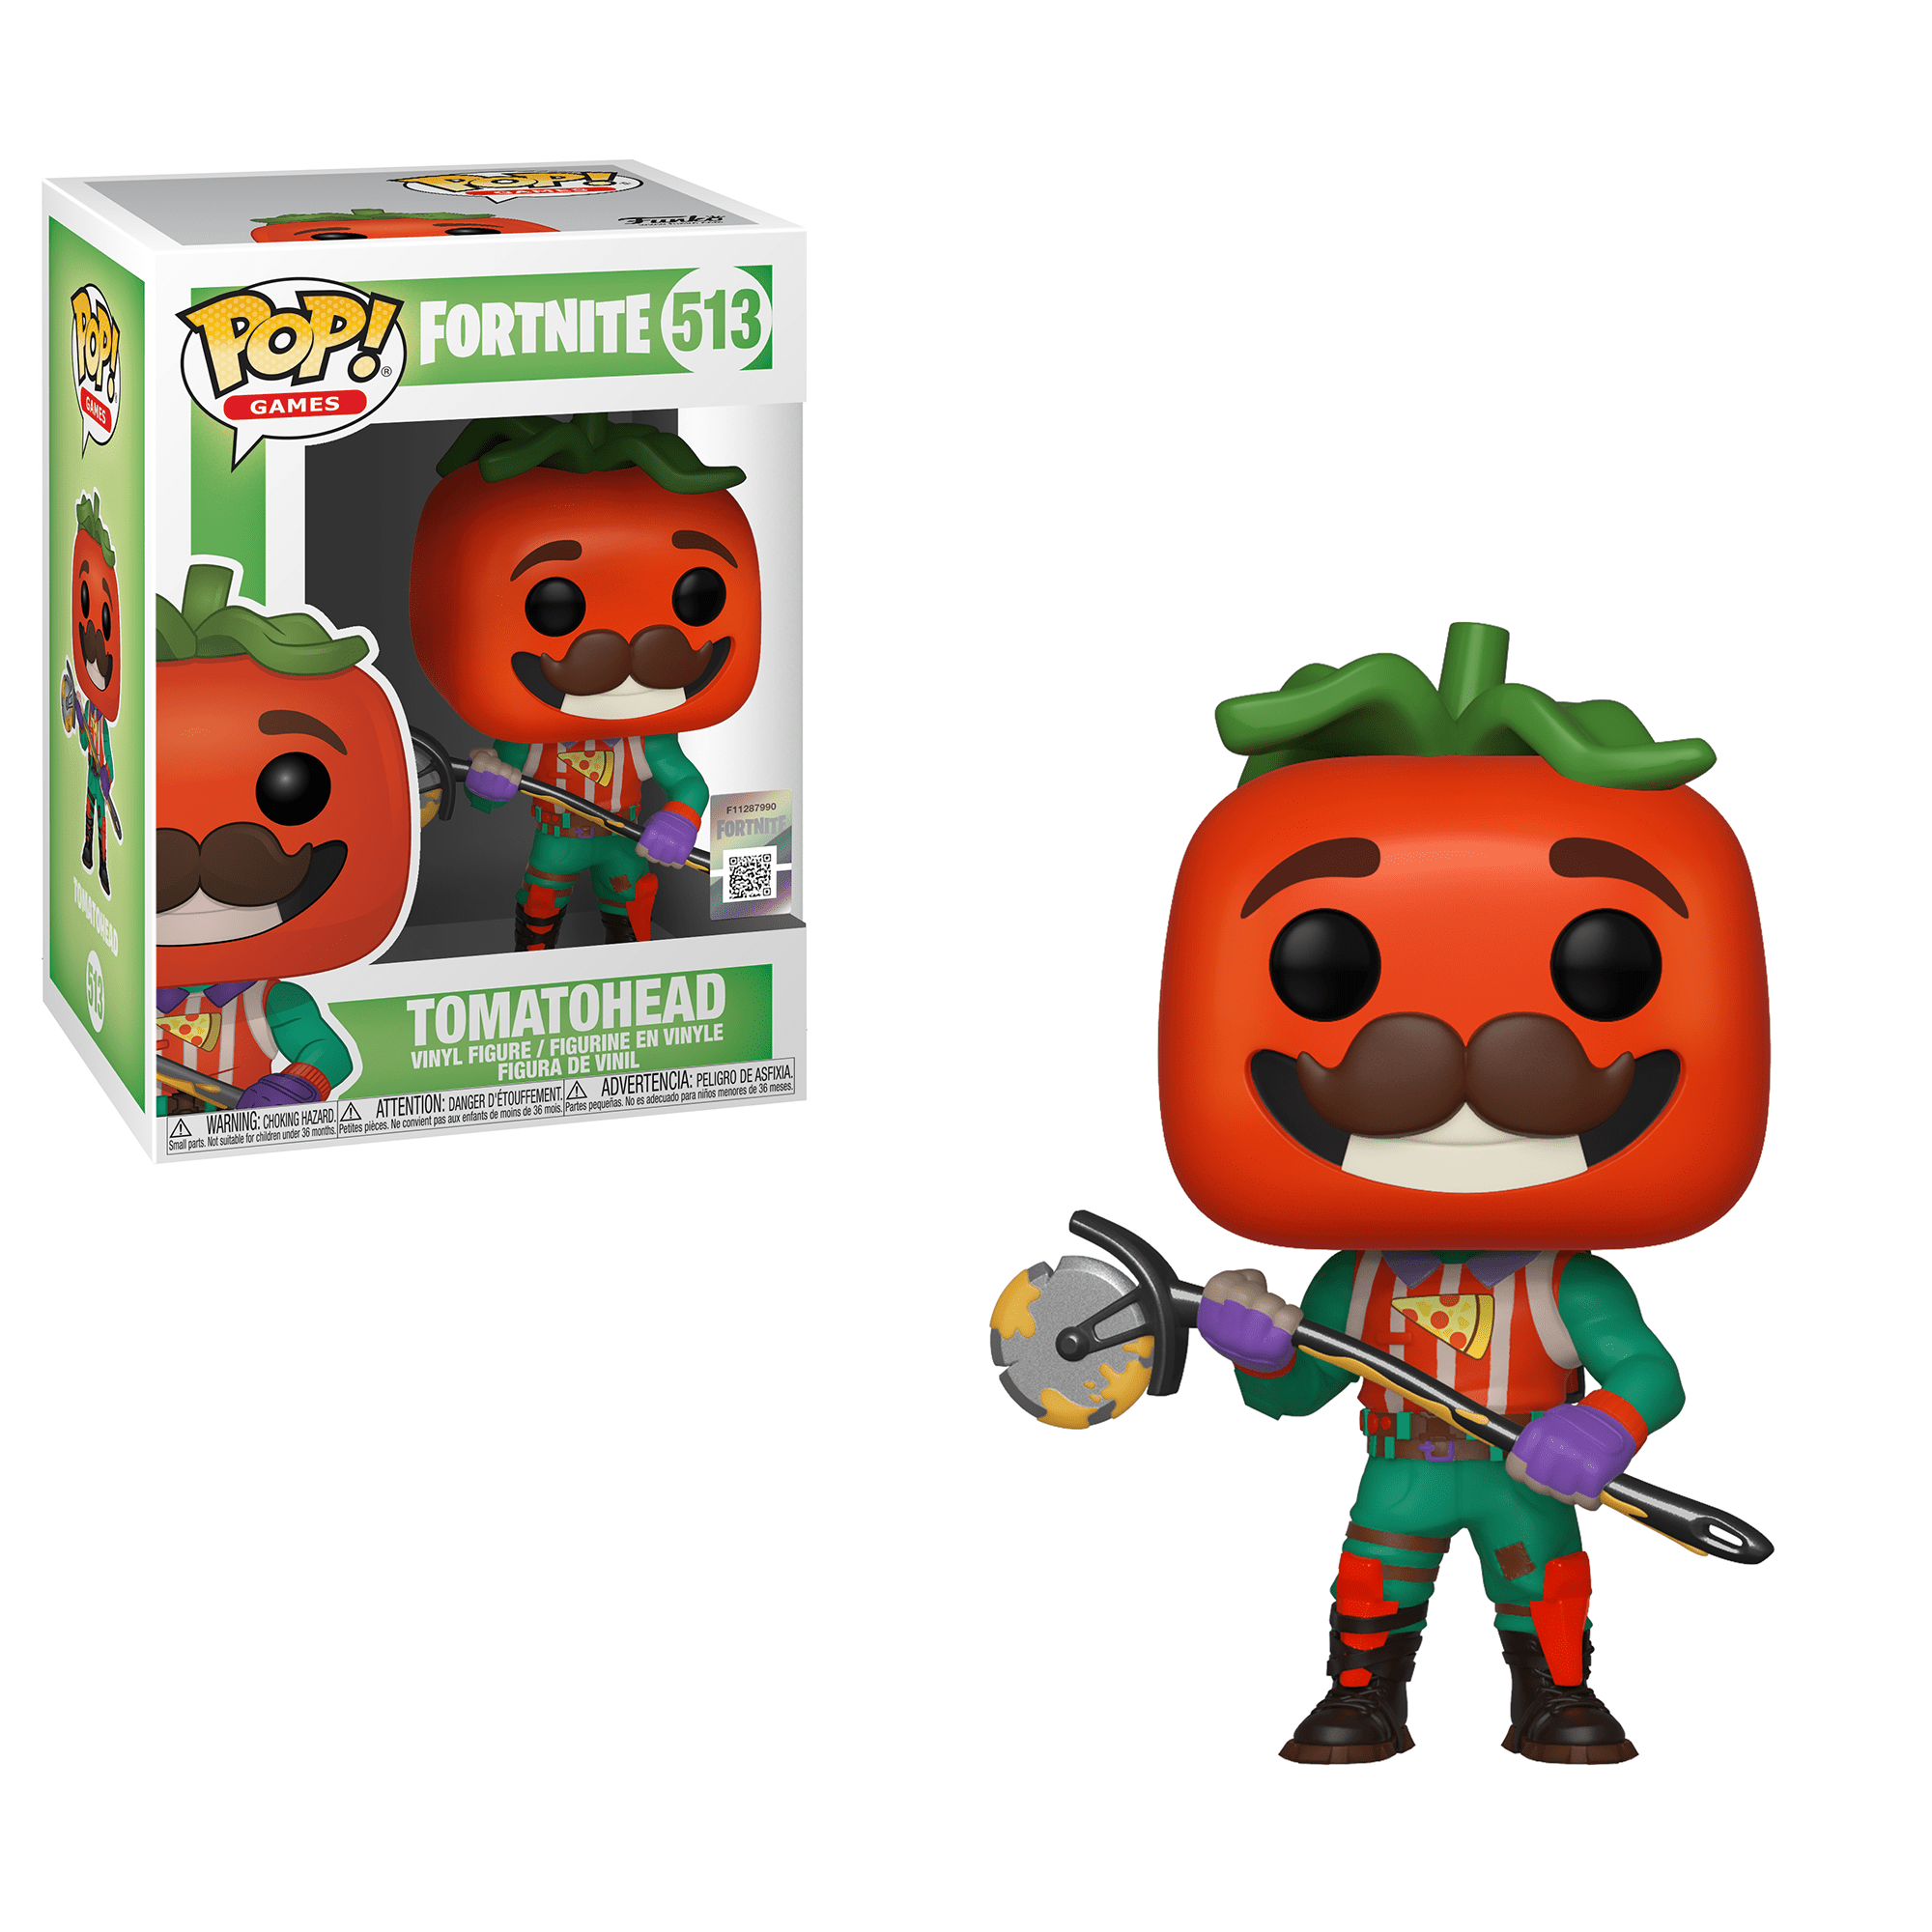 POP! Fortnite: Tomatohead